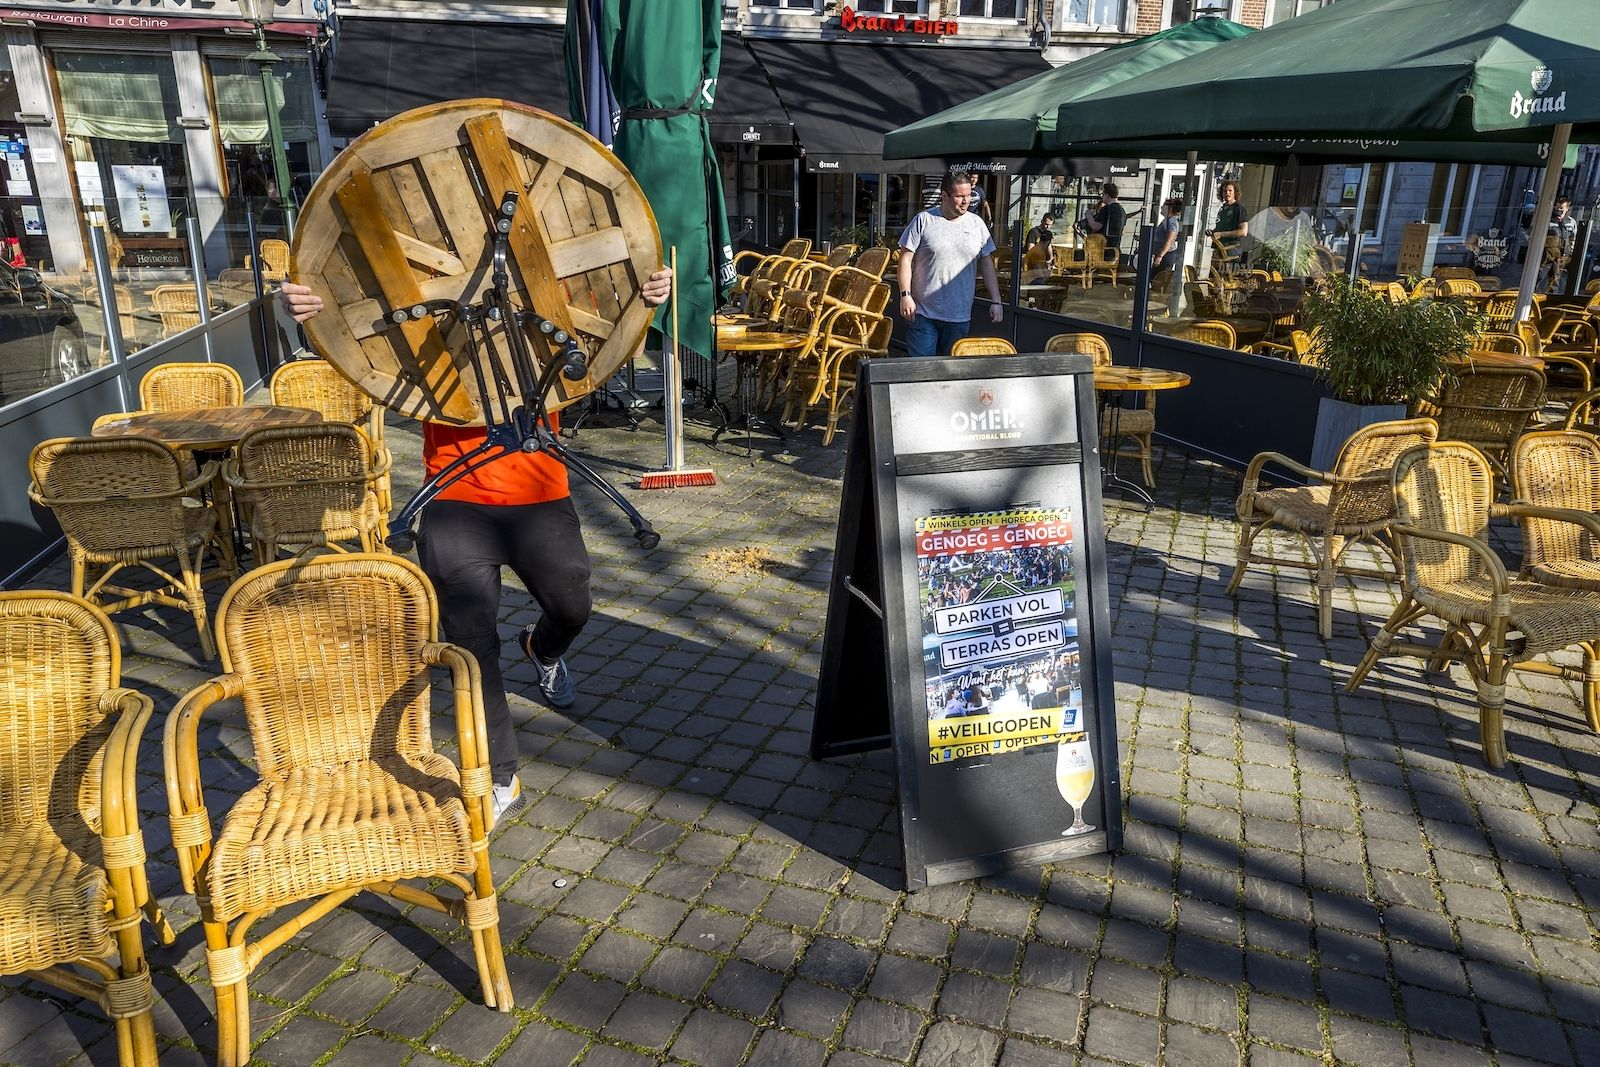 Maastricht terrassen horeca protest Rutte corona maatregelen